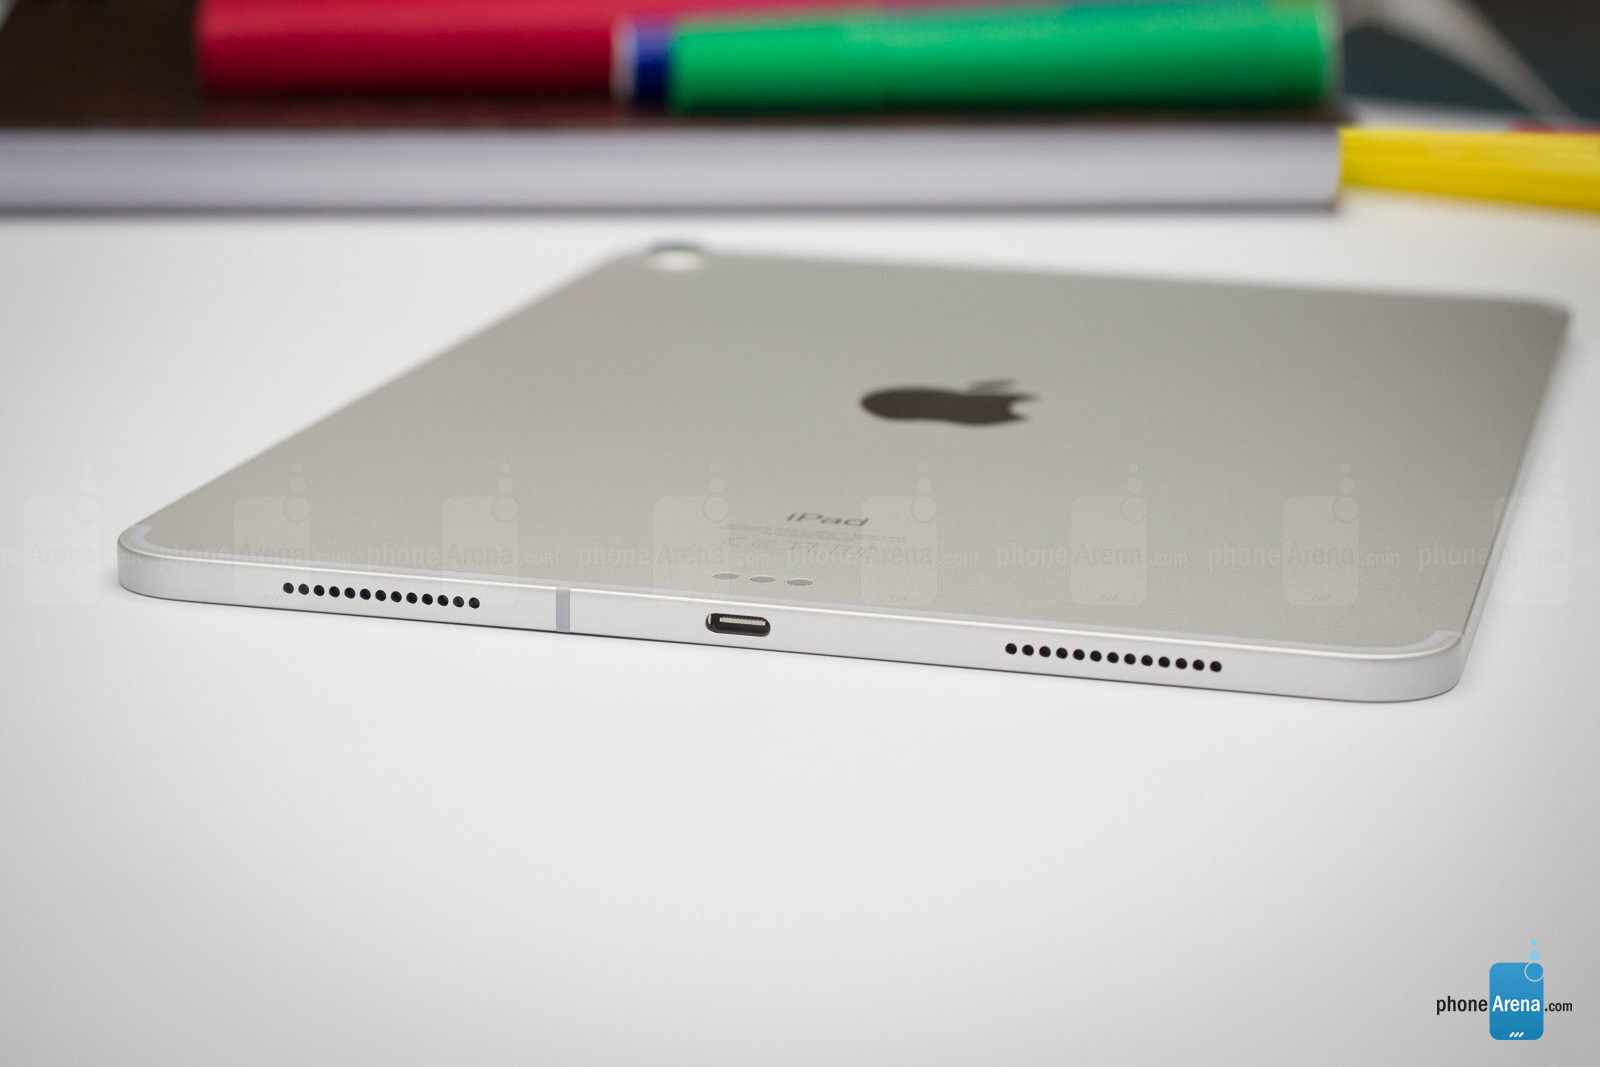 Apple iPad Pro (2018) Review - PhoneArena